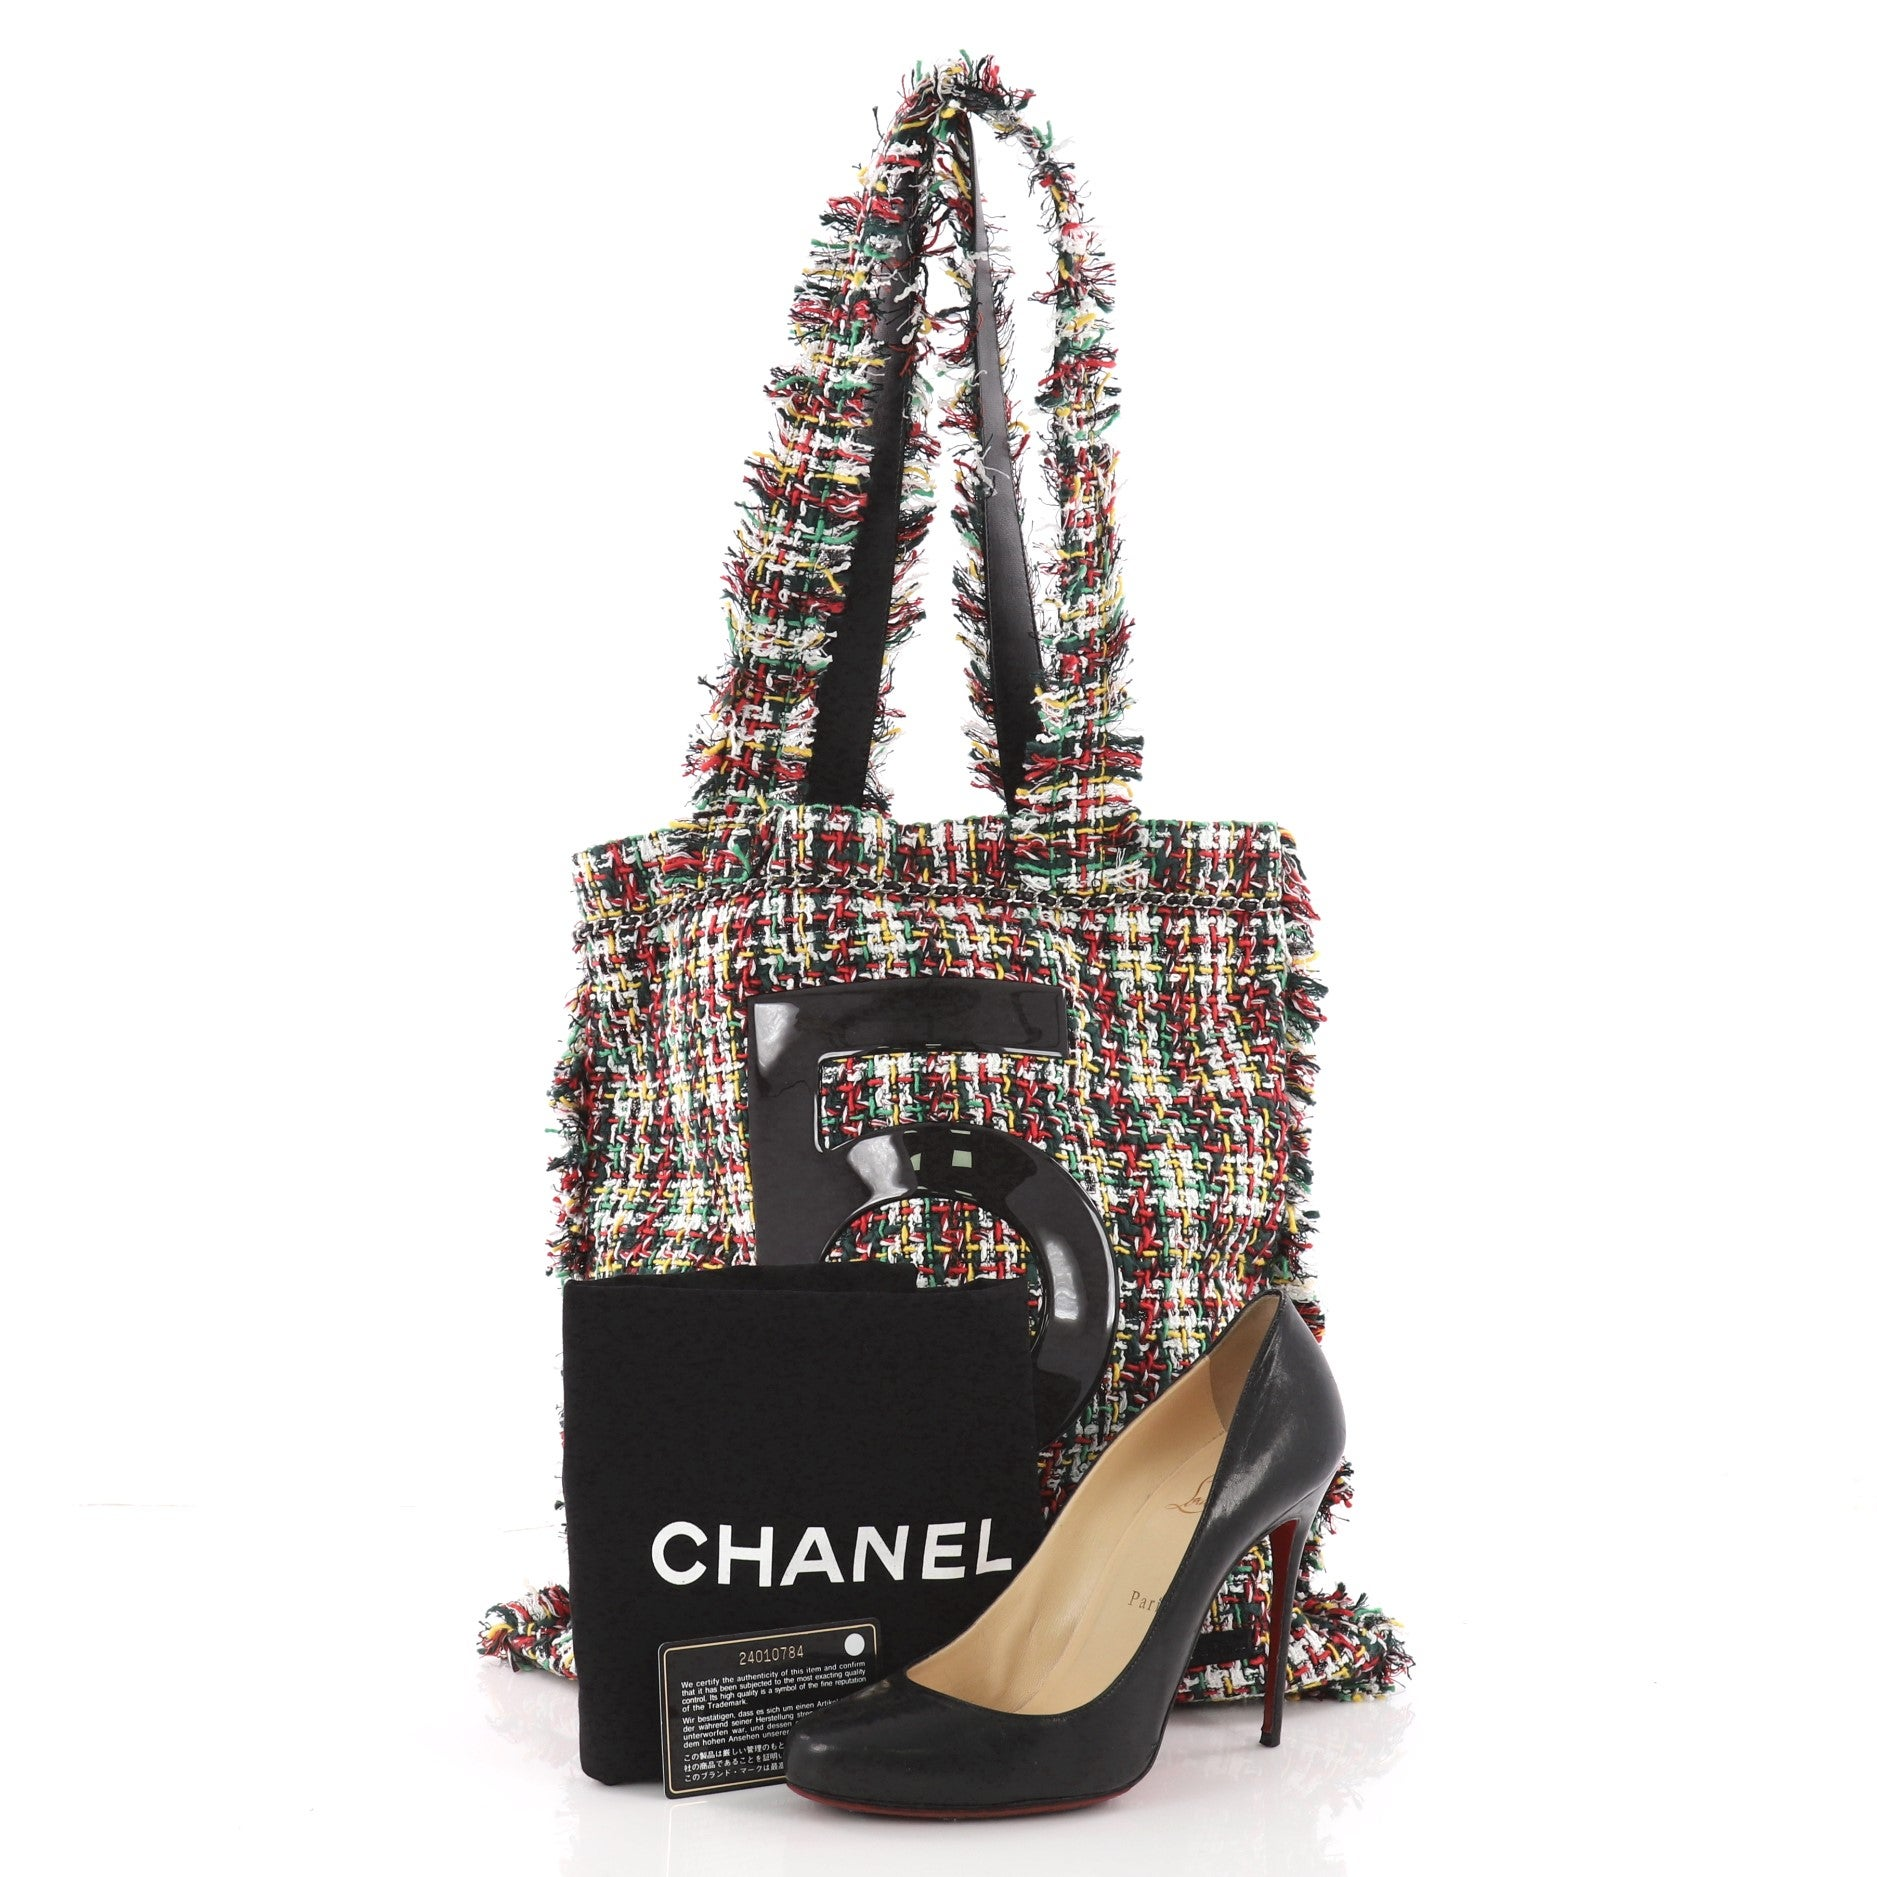 efe0b50f431a Chanel No. 5 Shopping Tote Tweed Large at 1stdibs